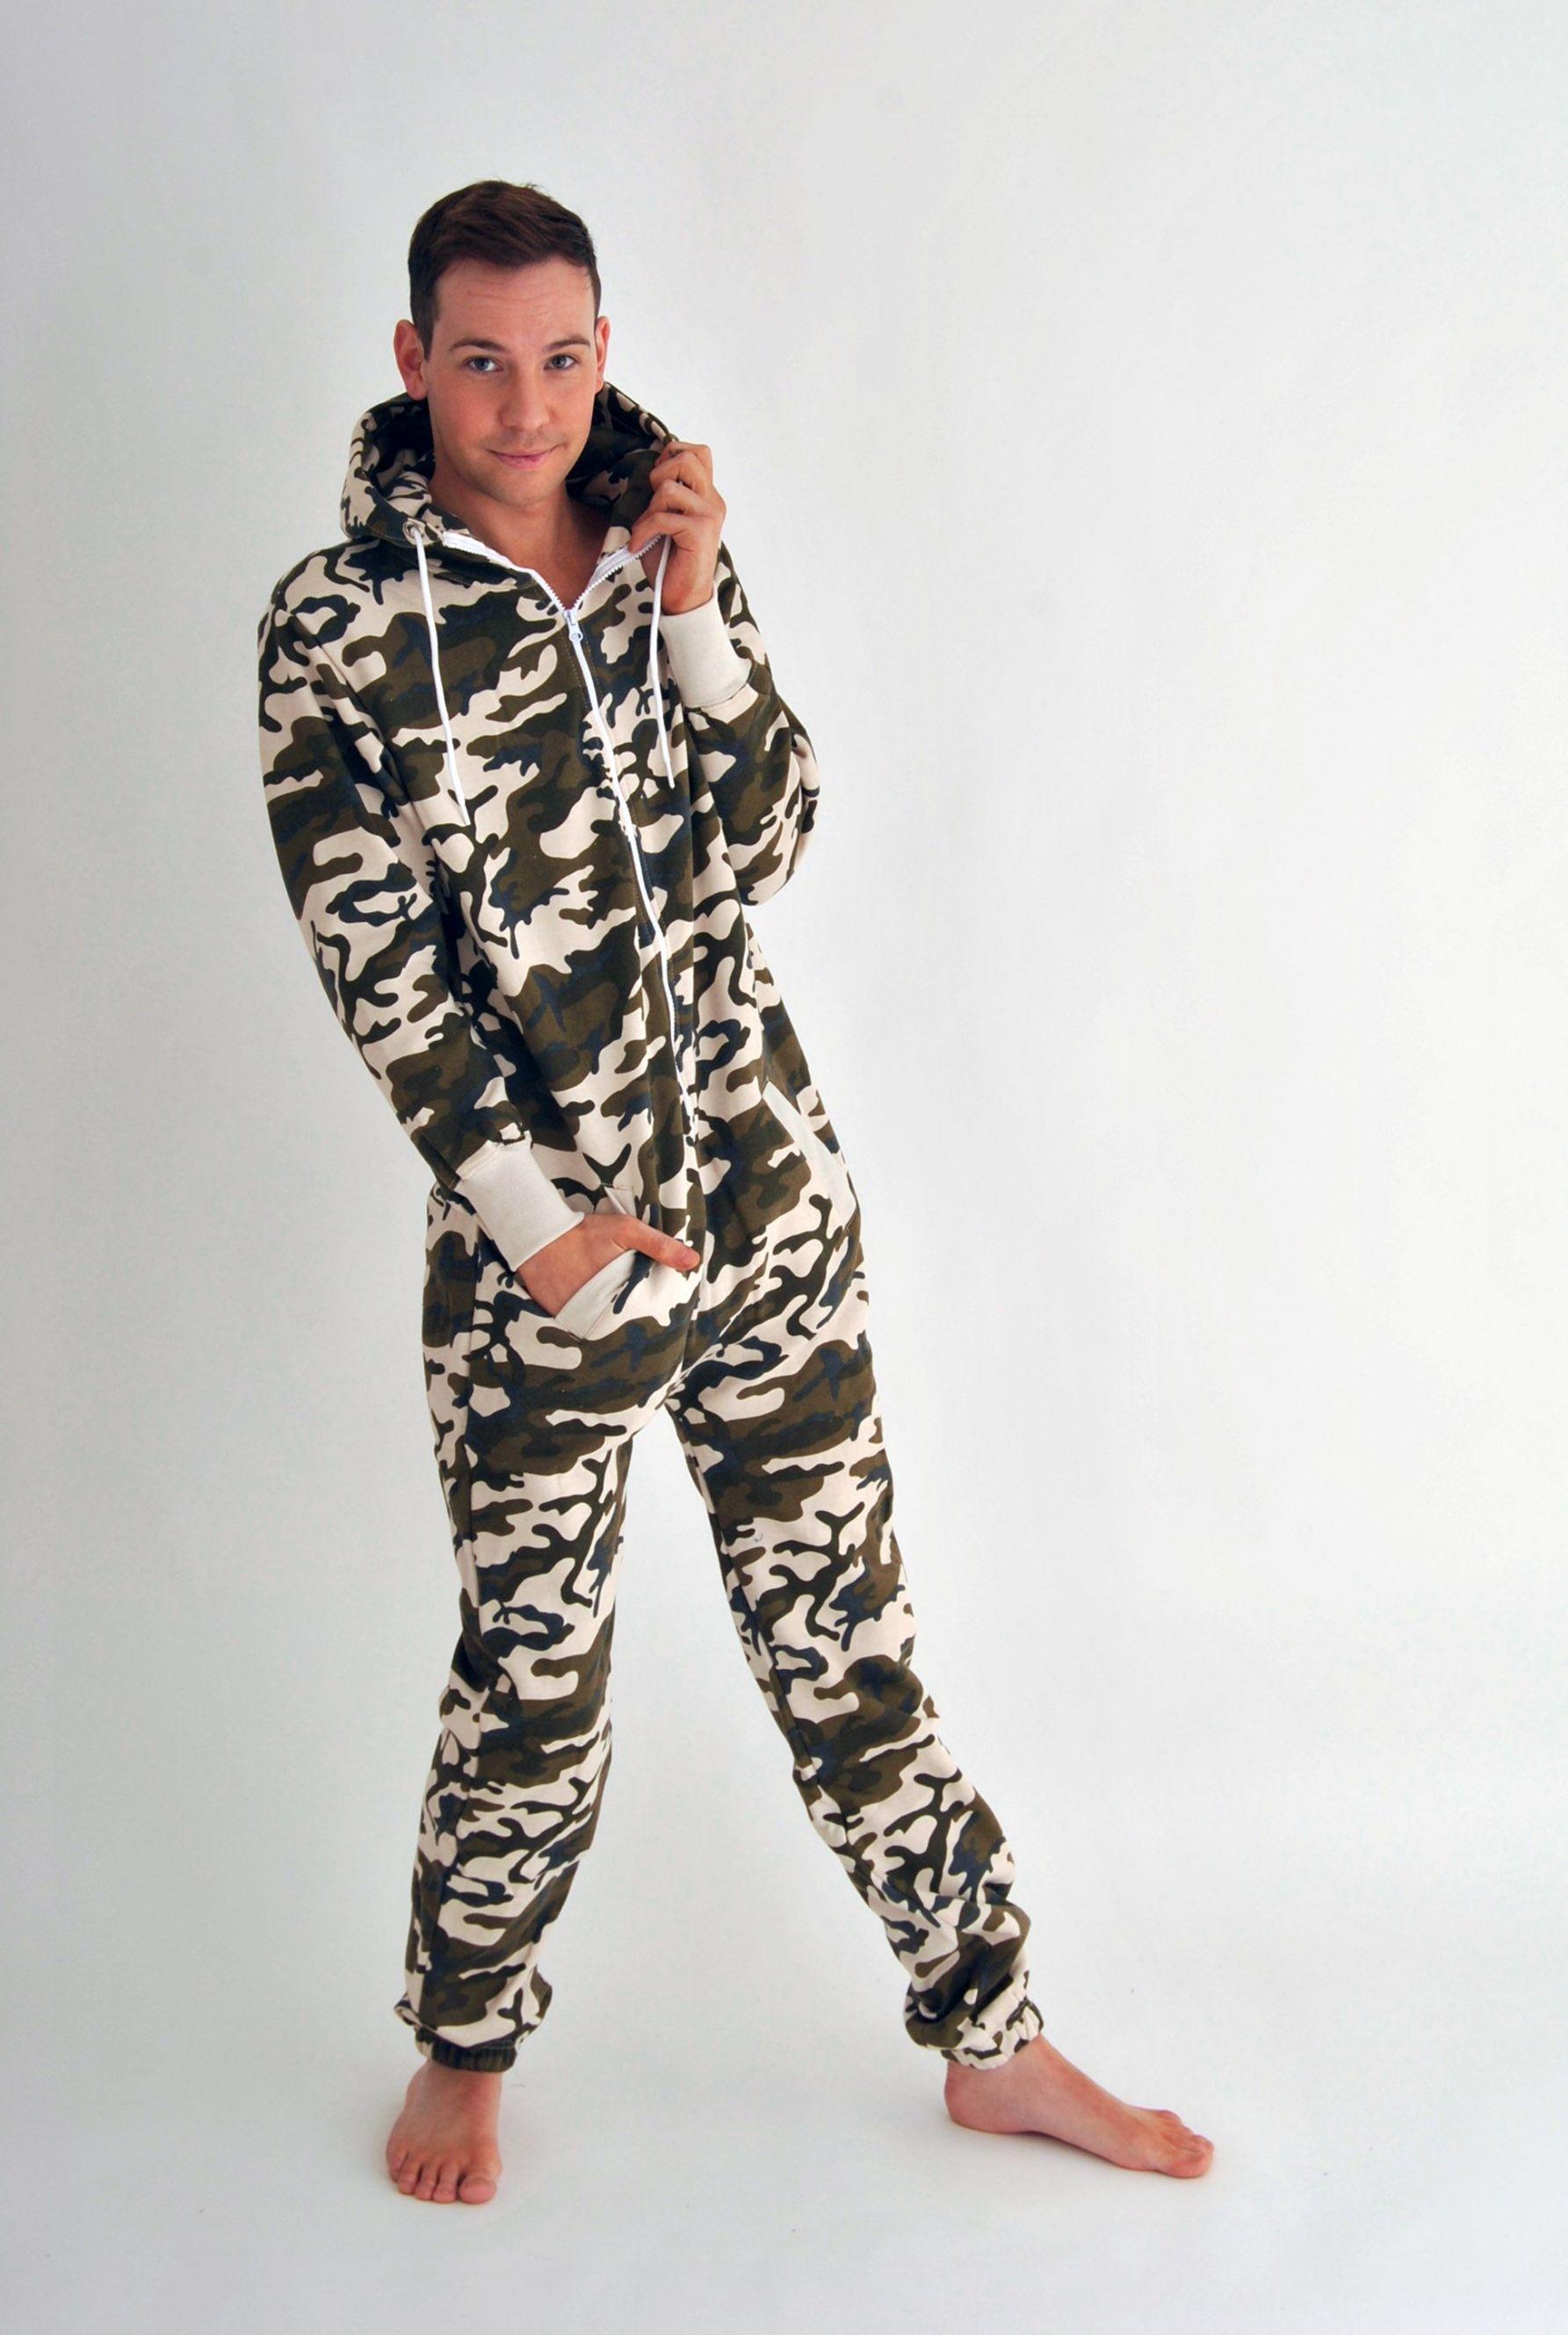 Mens camouflage printed hooded onesie for Mens dress shirt onesie